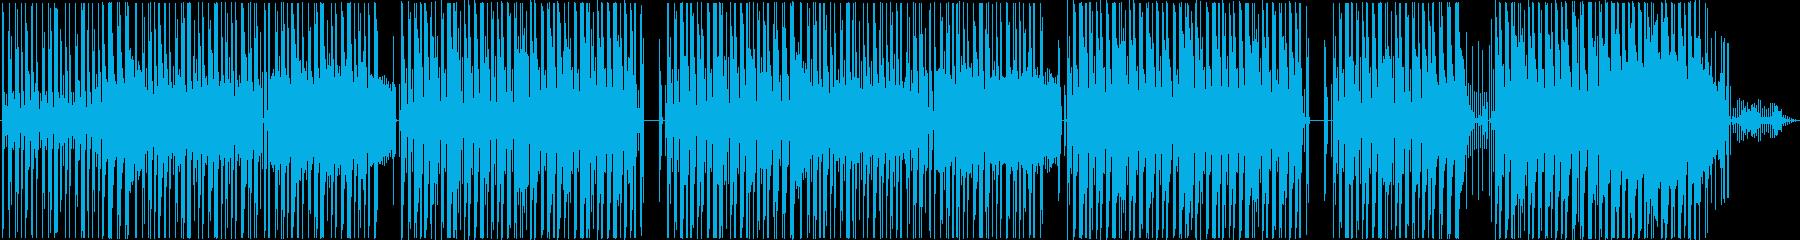 snoop doggっぽいヒップホップの再生済みの波形